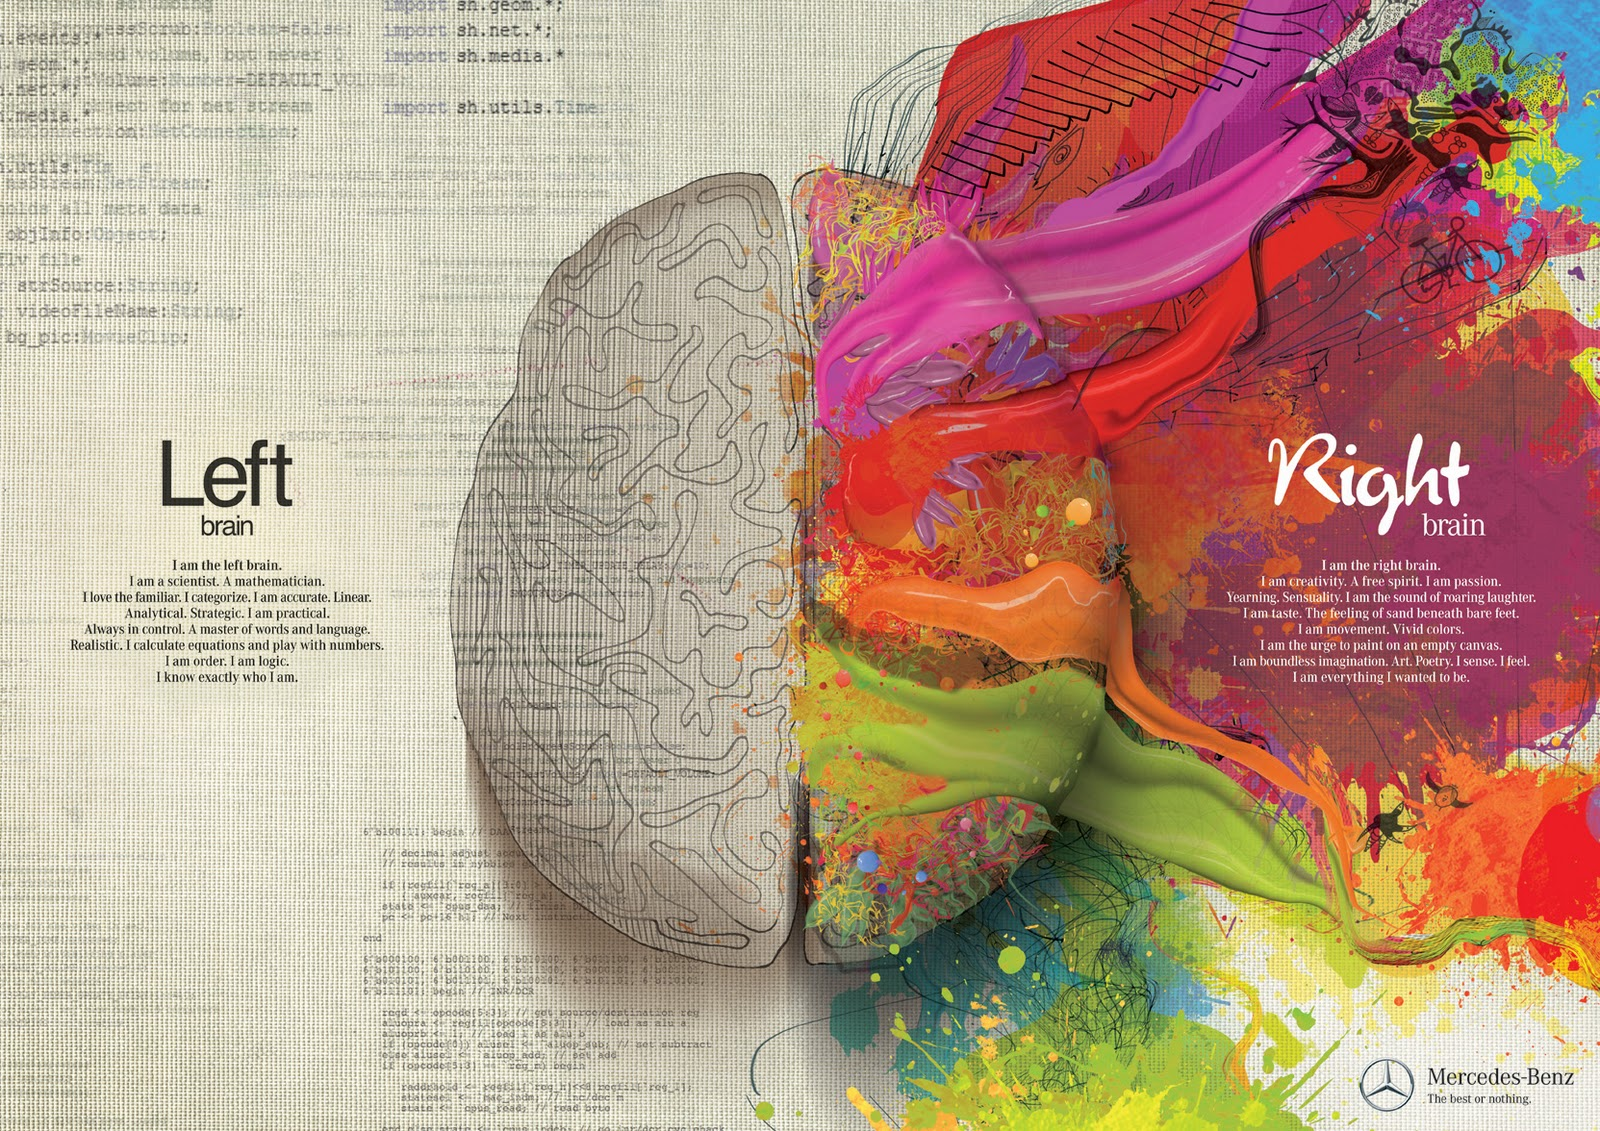 mercedes-benz-left-brain-right-brain-pai